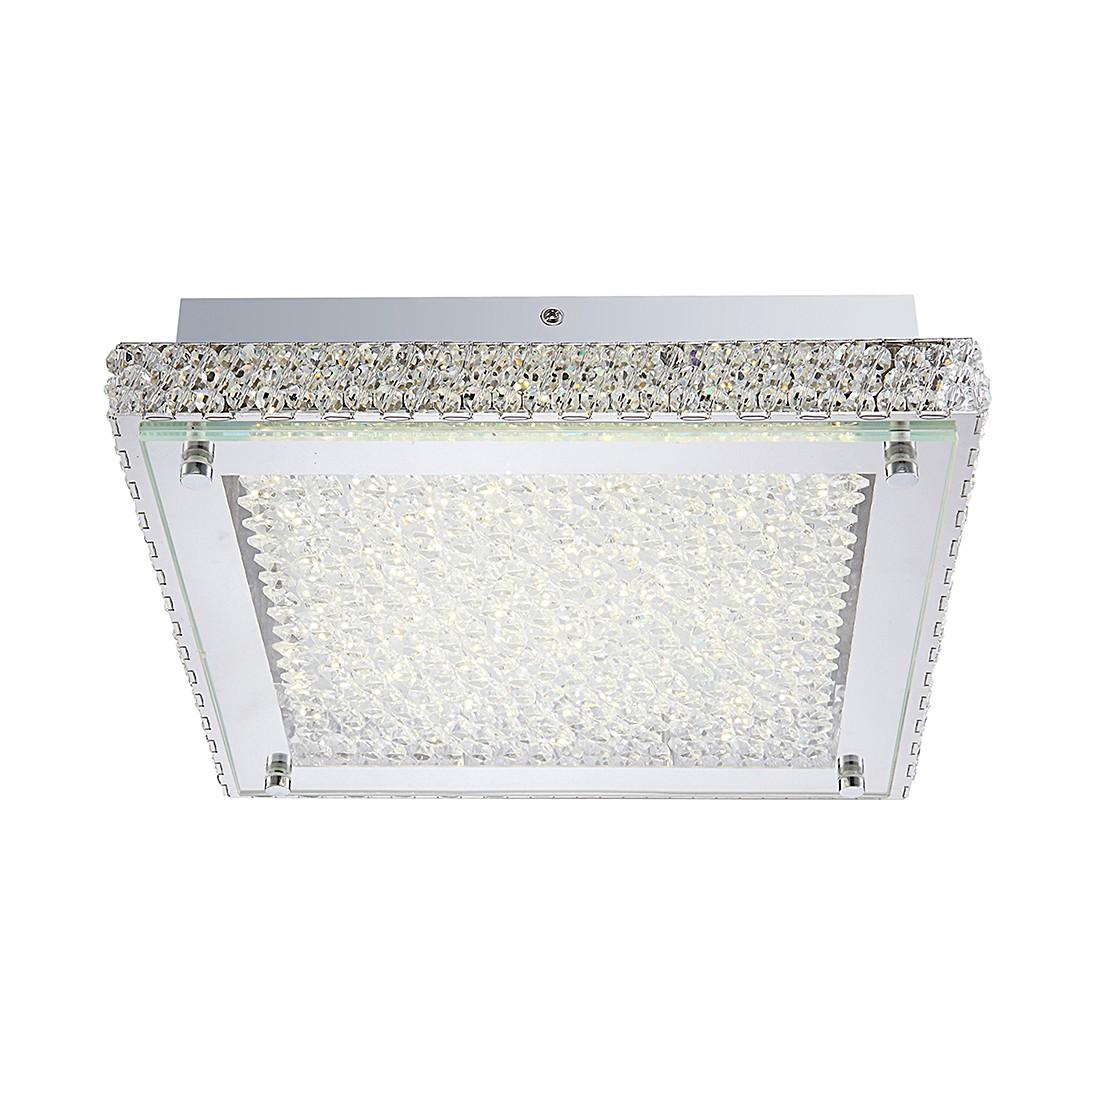 Deckenleuchte DL CHROM, 1XLED – Metall – Silber – 1-flammig, Globo Lighting kaufen